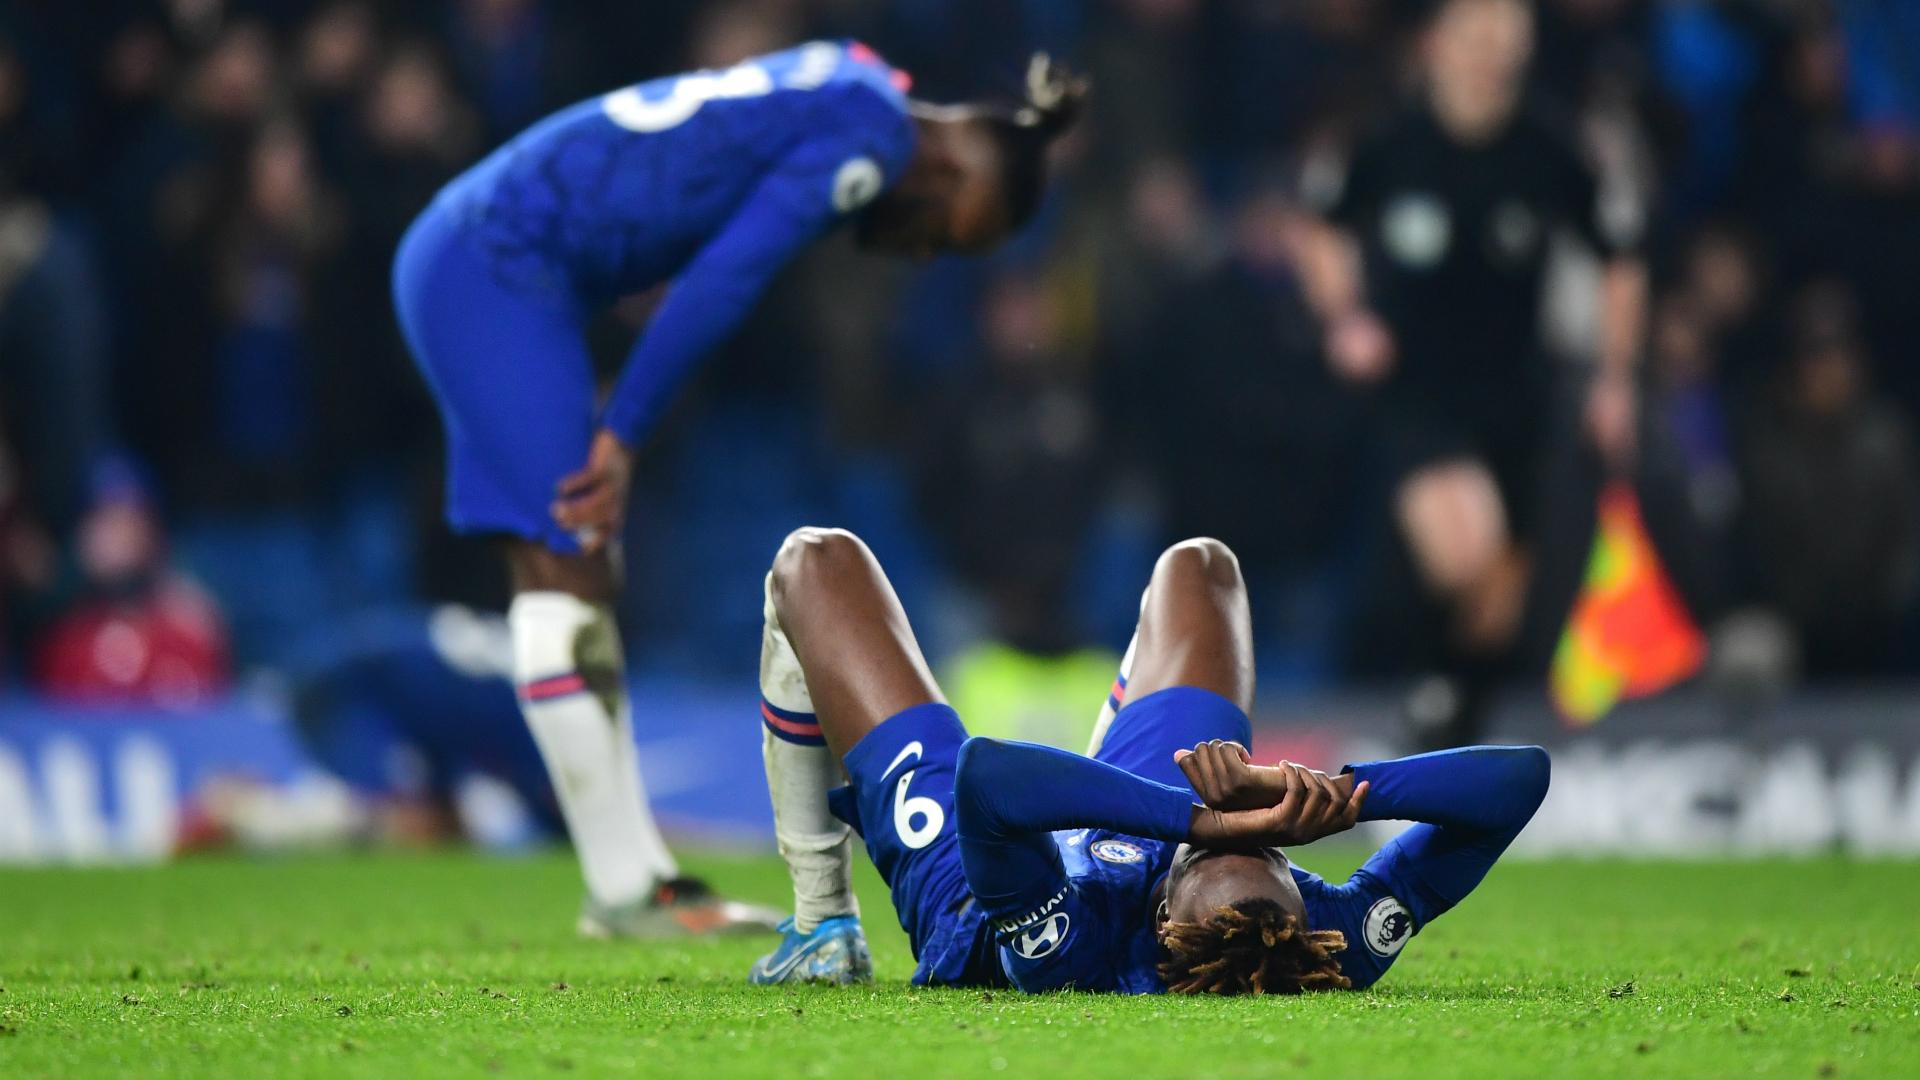 Jorginho: Arsenal draw feels like a loss for wasteful Chelsea